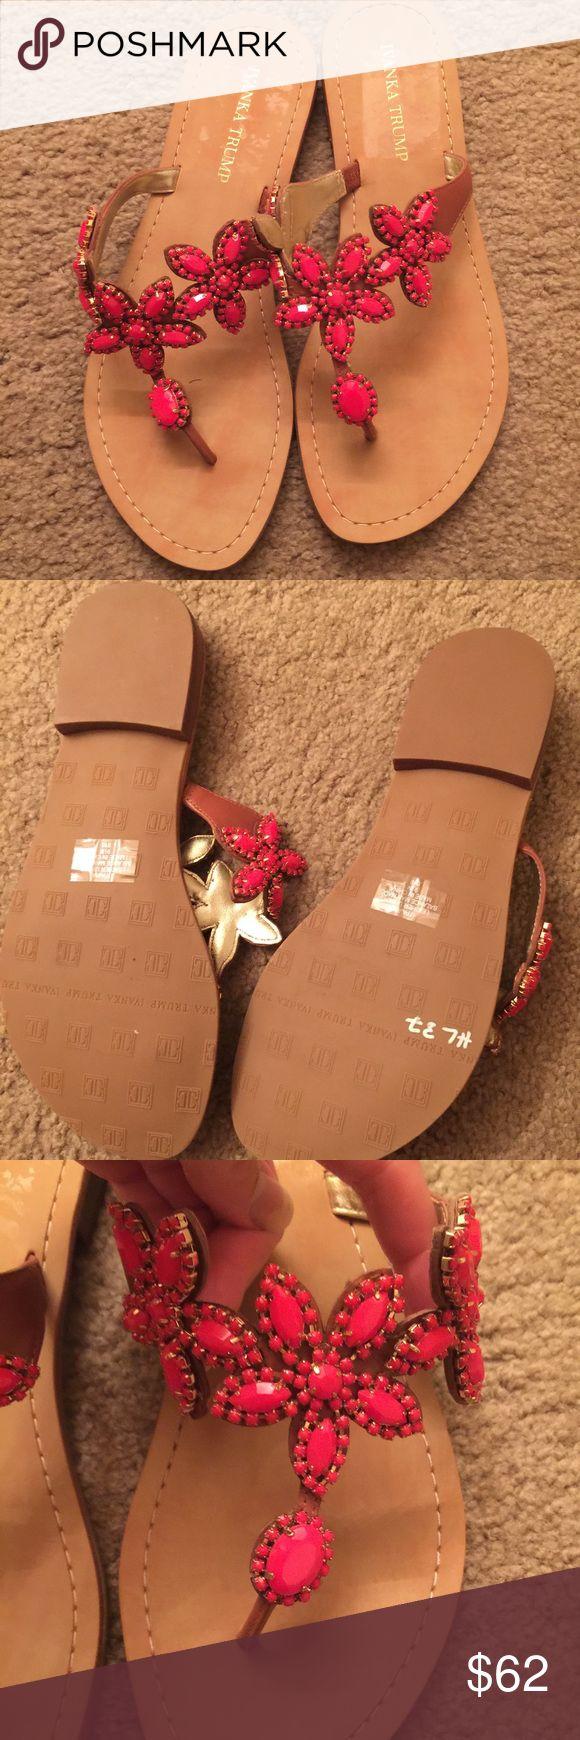 NWOT Ivanka Trump jeweled coral flip flip Flower coral beading on this camel flip flop. Slight heel for support. Never worn!!! Ivanka Trump Shoes Sandals